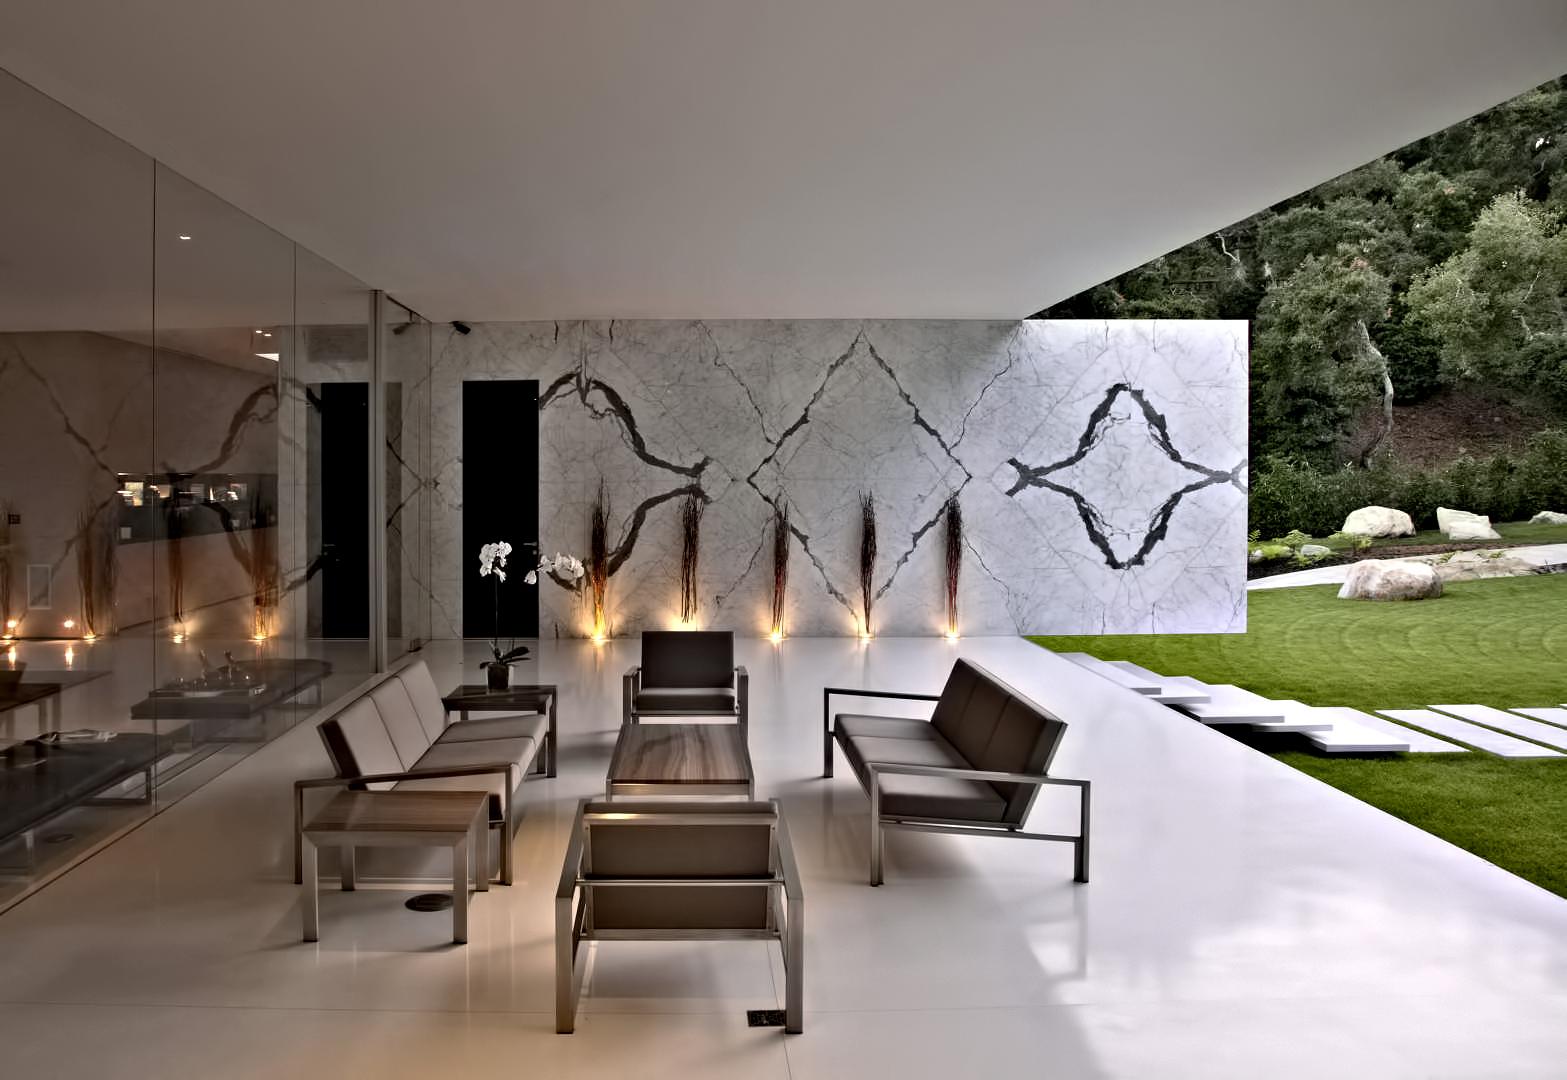 The Glass Pavilion – 780 Ashley Rd, Montecito, CA, USA